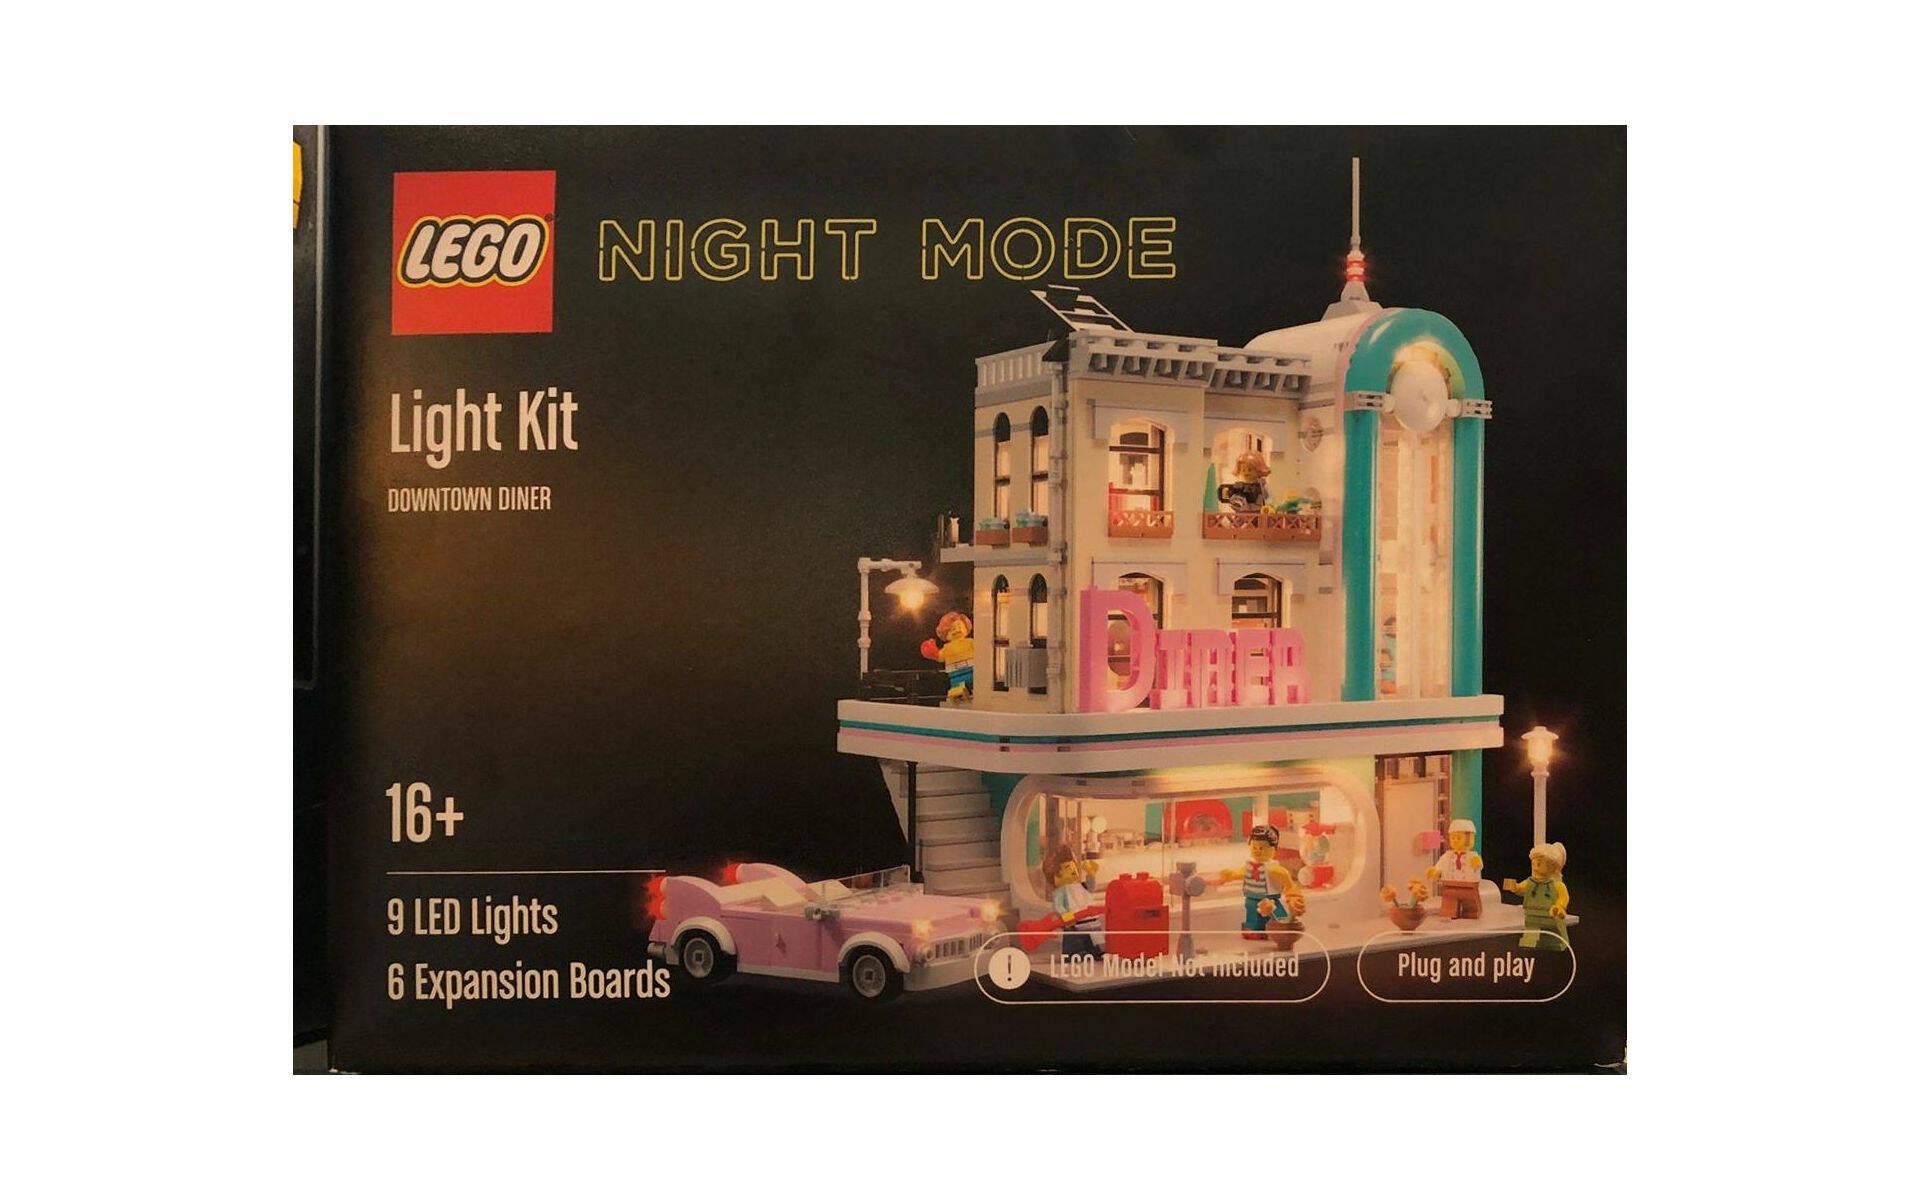 LEGO LAB CUSTOM City Set